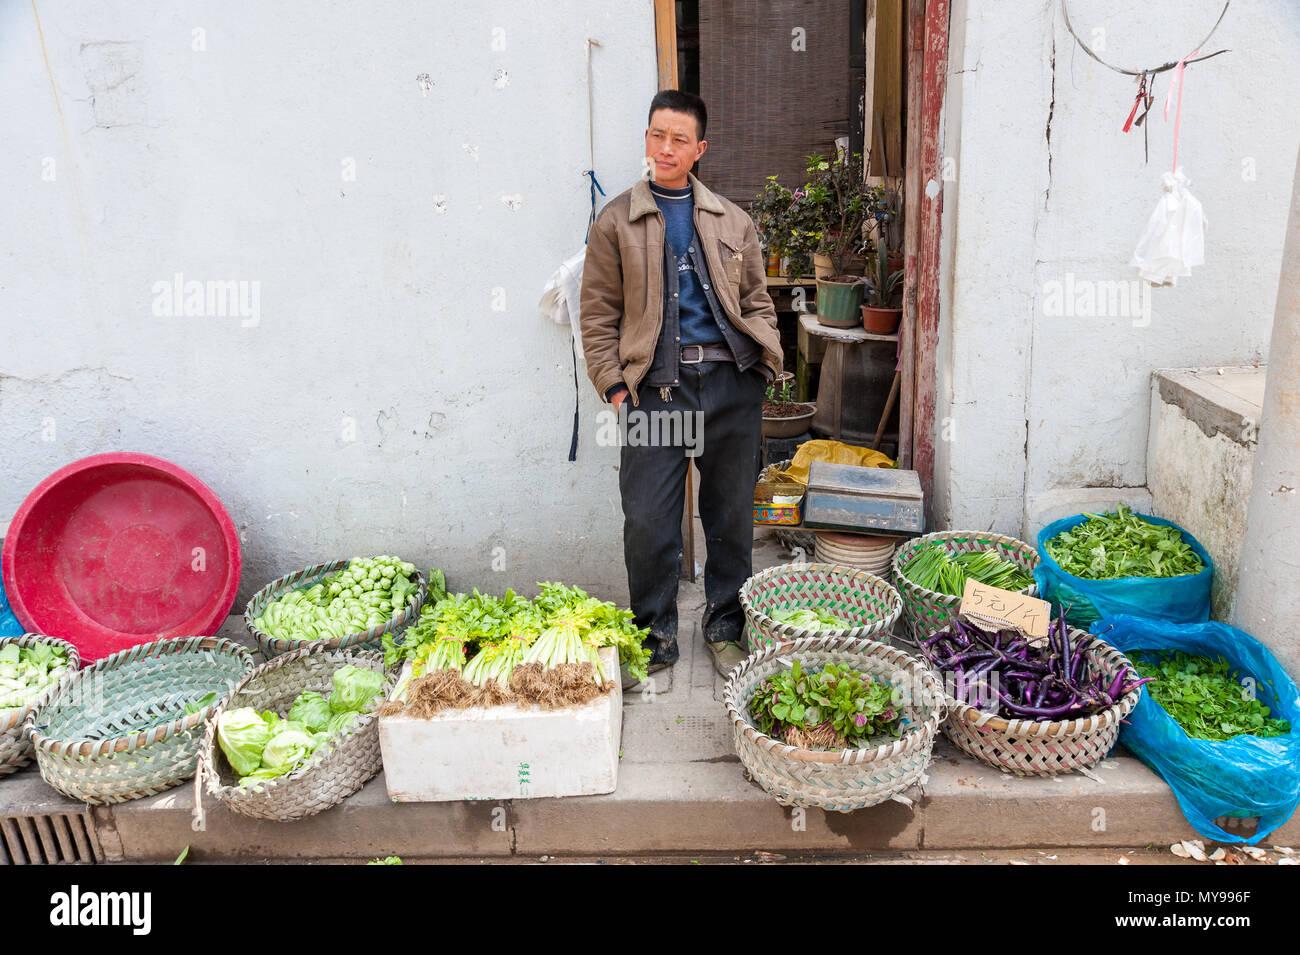 Man selling fresh produce from countryside at market stall on Dajing Road Market, Shanghai, China - Stock Image